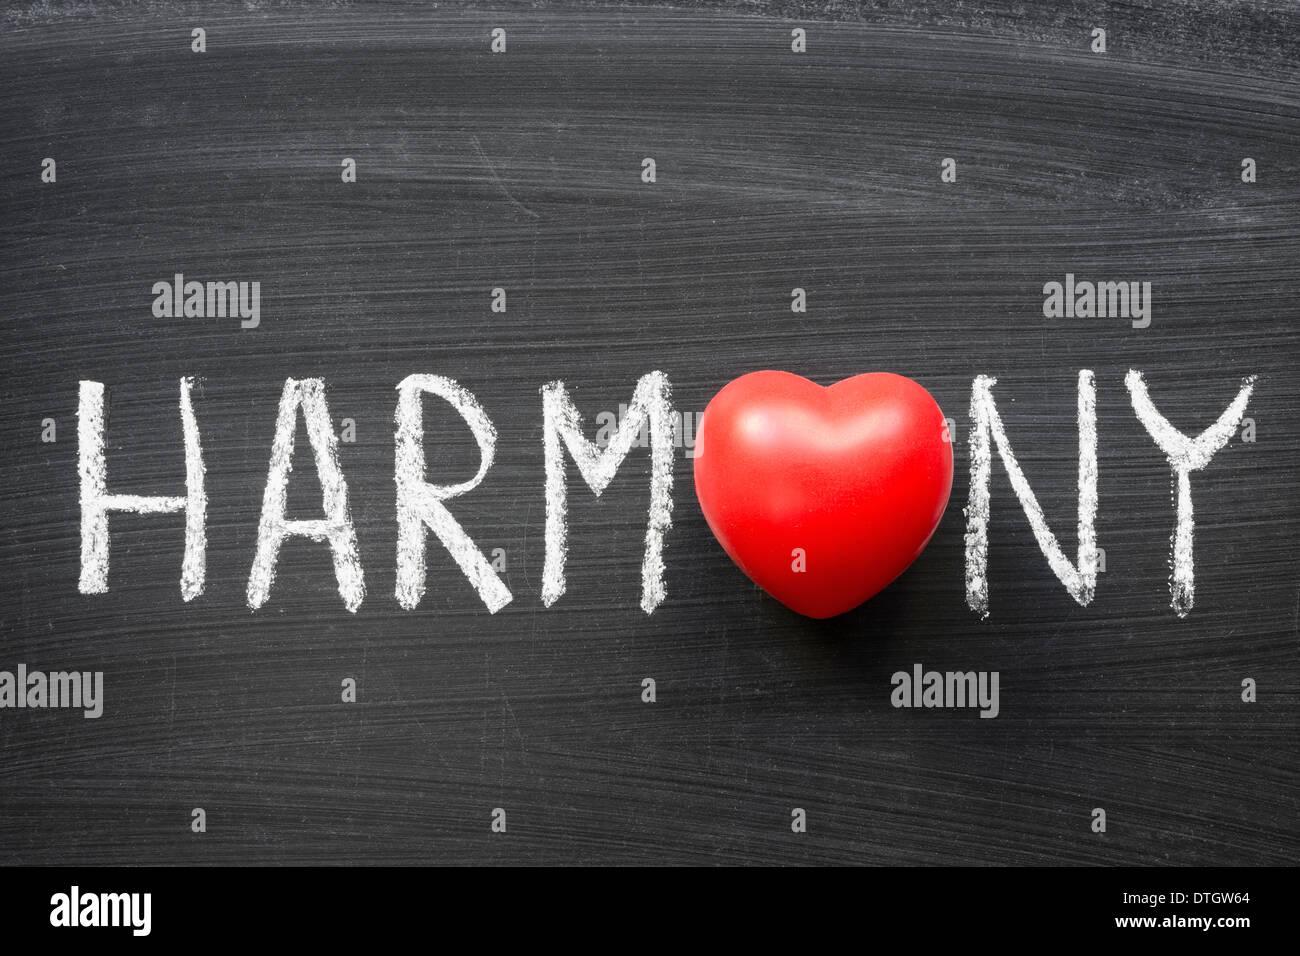 Harmony word handwritten on blackboard with heart symbol instead o harmony word handwritten on blackboard with heart symbol instead o biocorpaavc